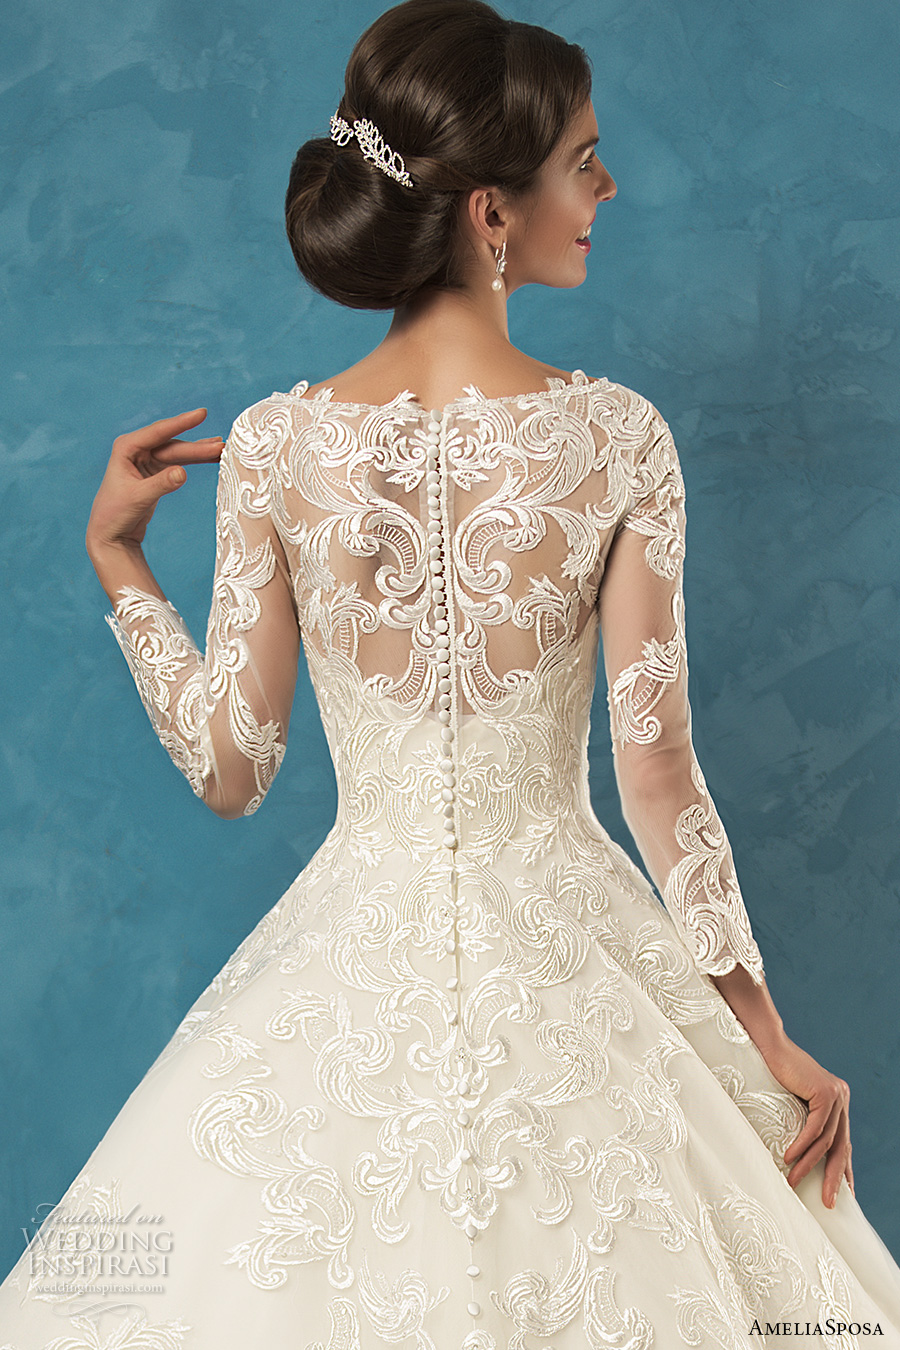 8a256dbd82 Amelia Sposa 2017 Wedding Dresses   Wedding Inspirasi